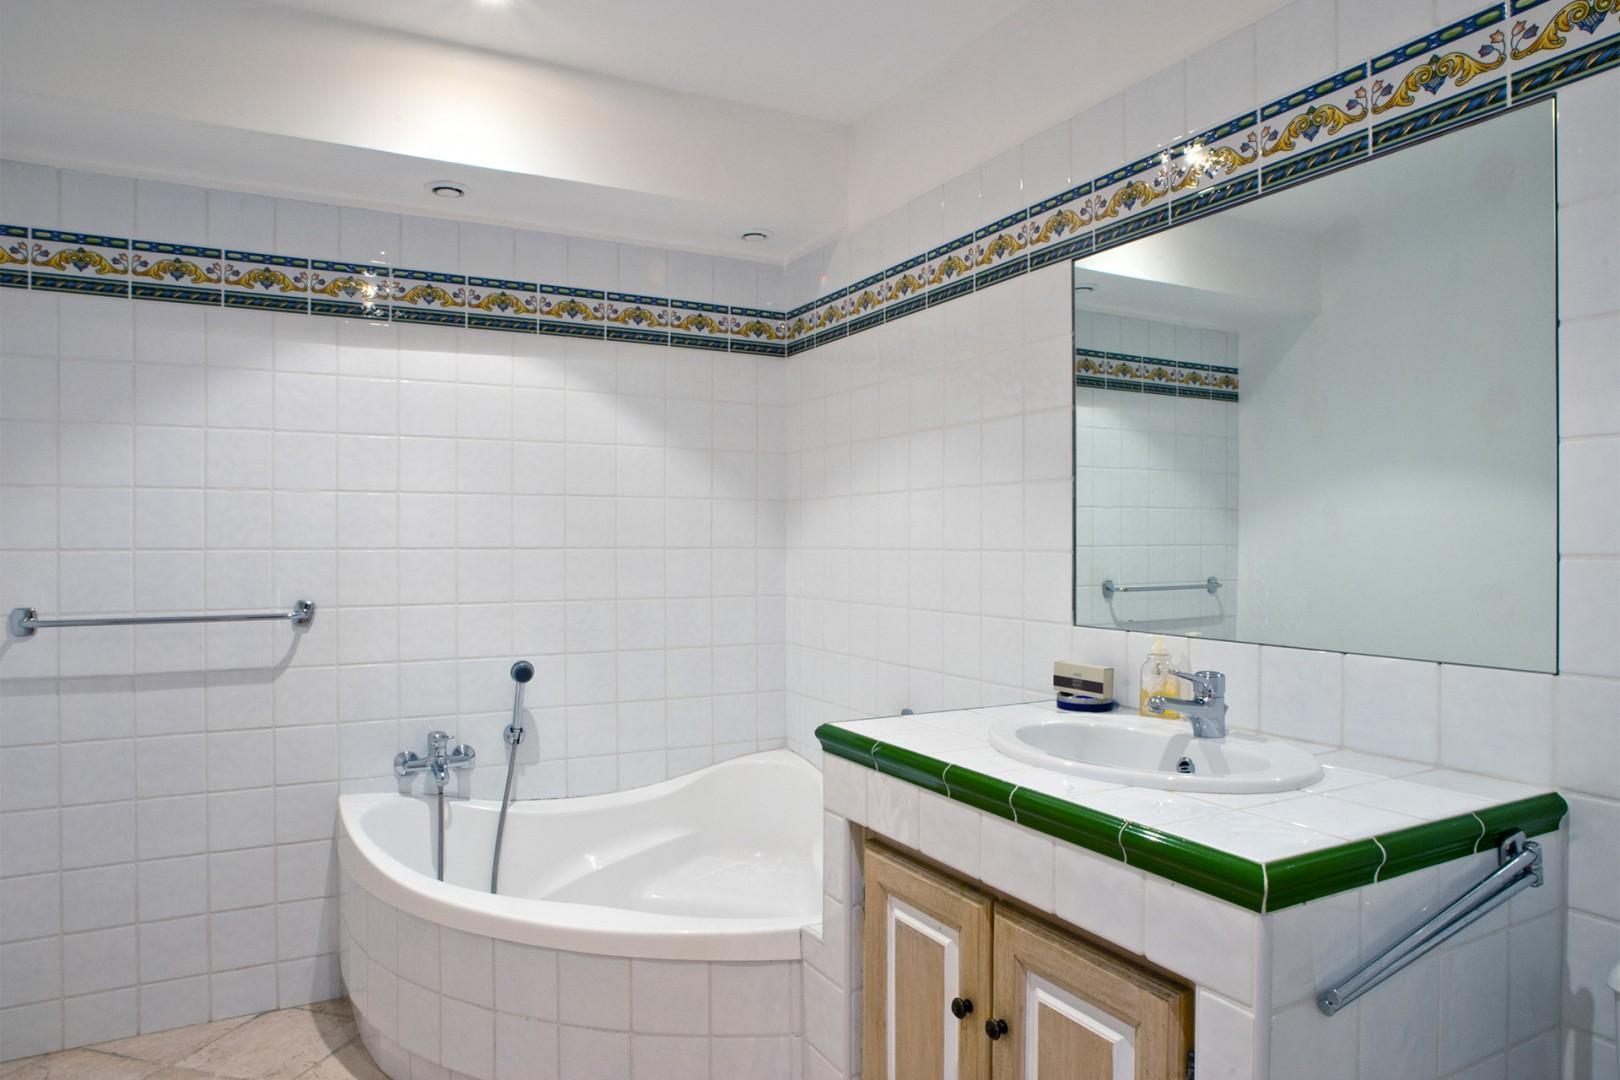 En suite bathroom 4 to bedroom 6 with large bath and sink